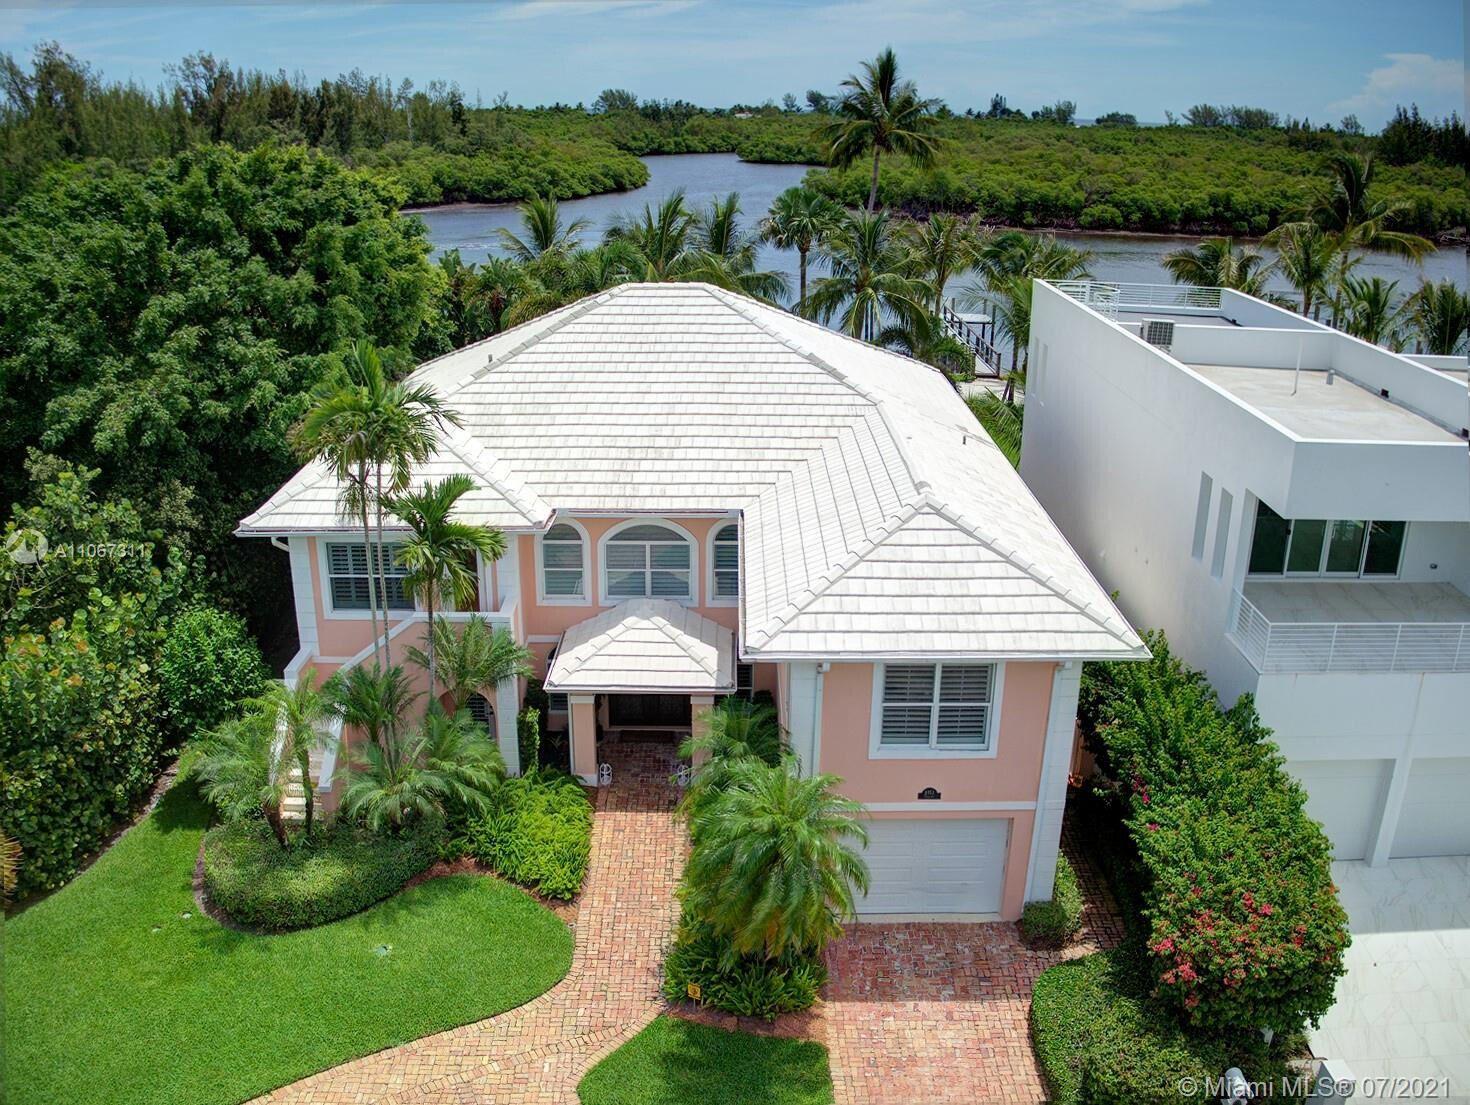 Photo of 9353 SE Se Yardarm Terrace, Hobe Sound, FL 33455 (MLS # RX-10754086)